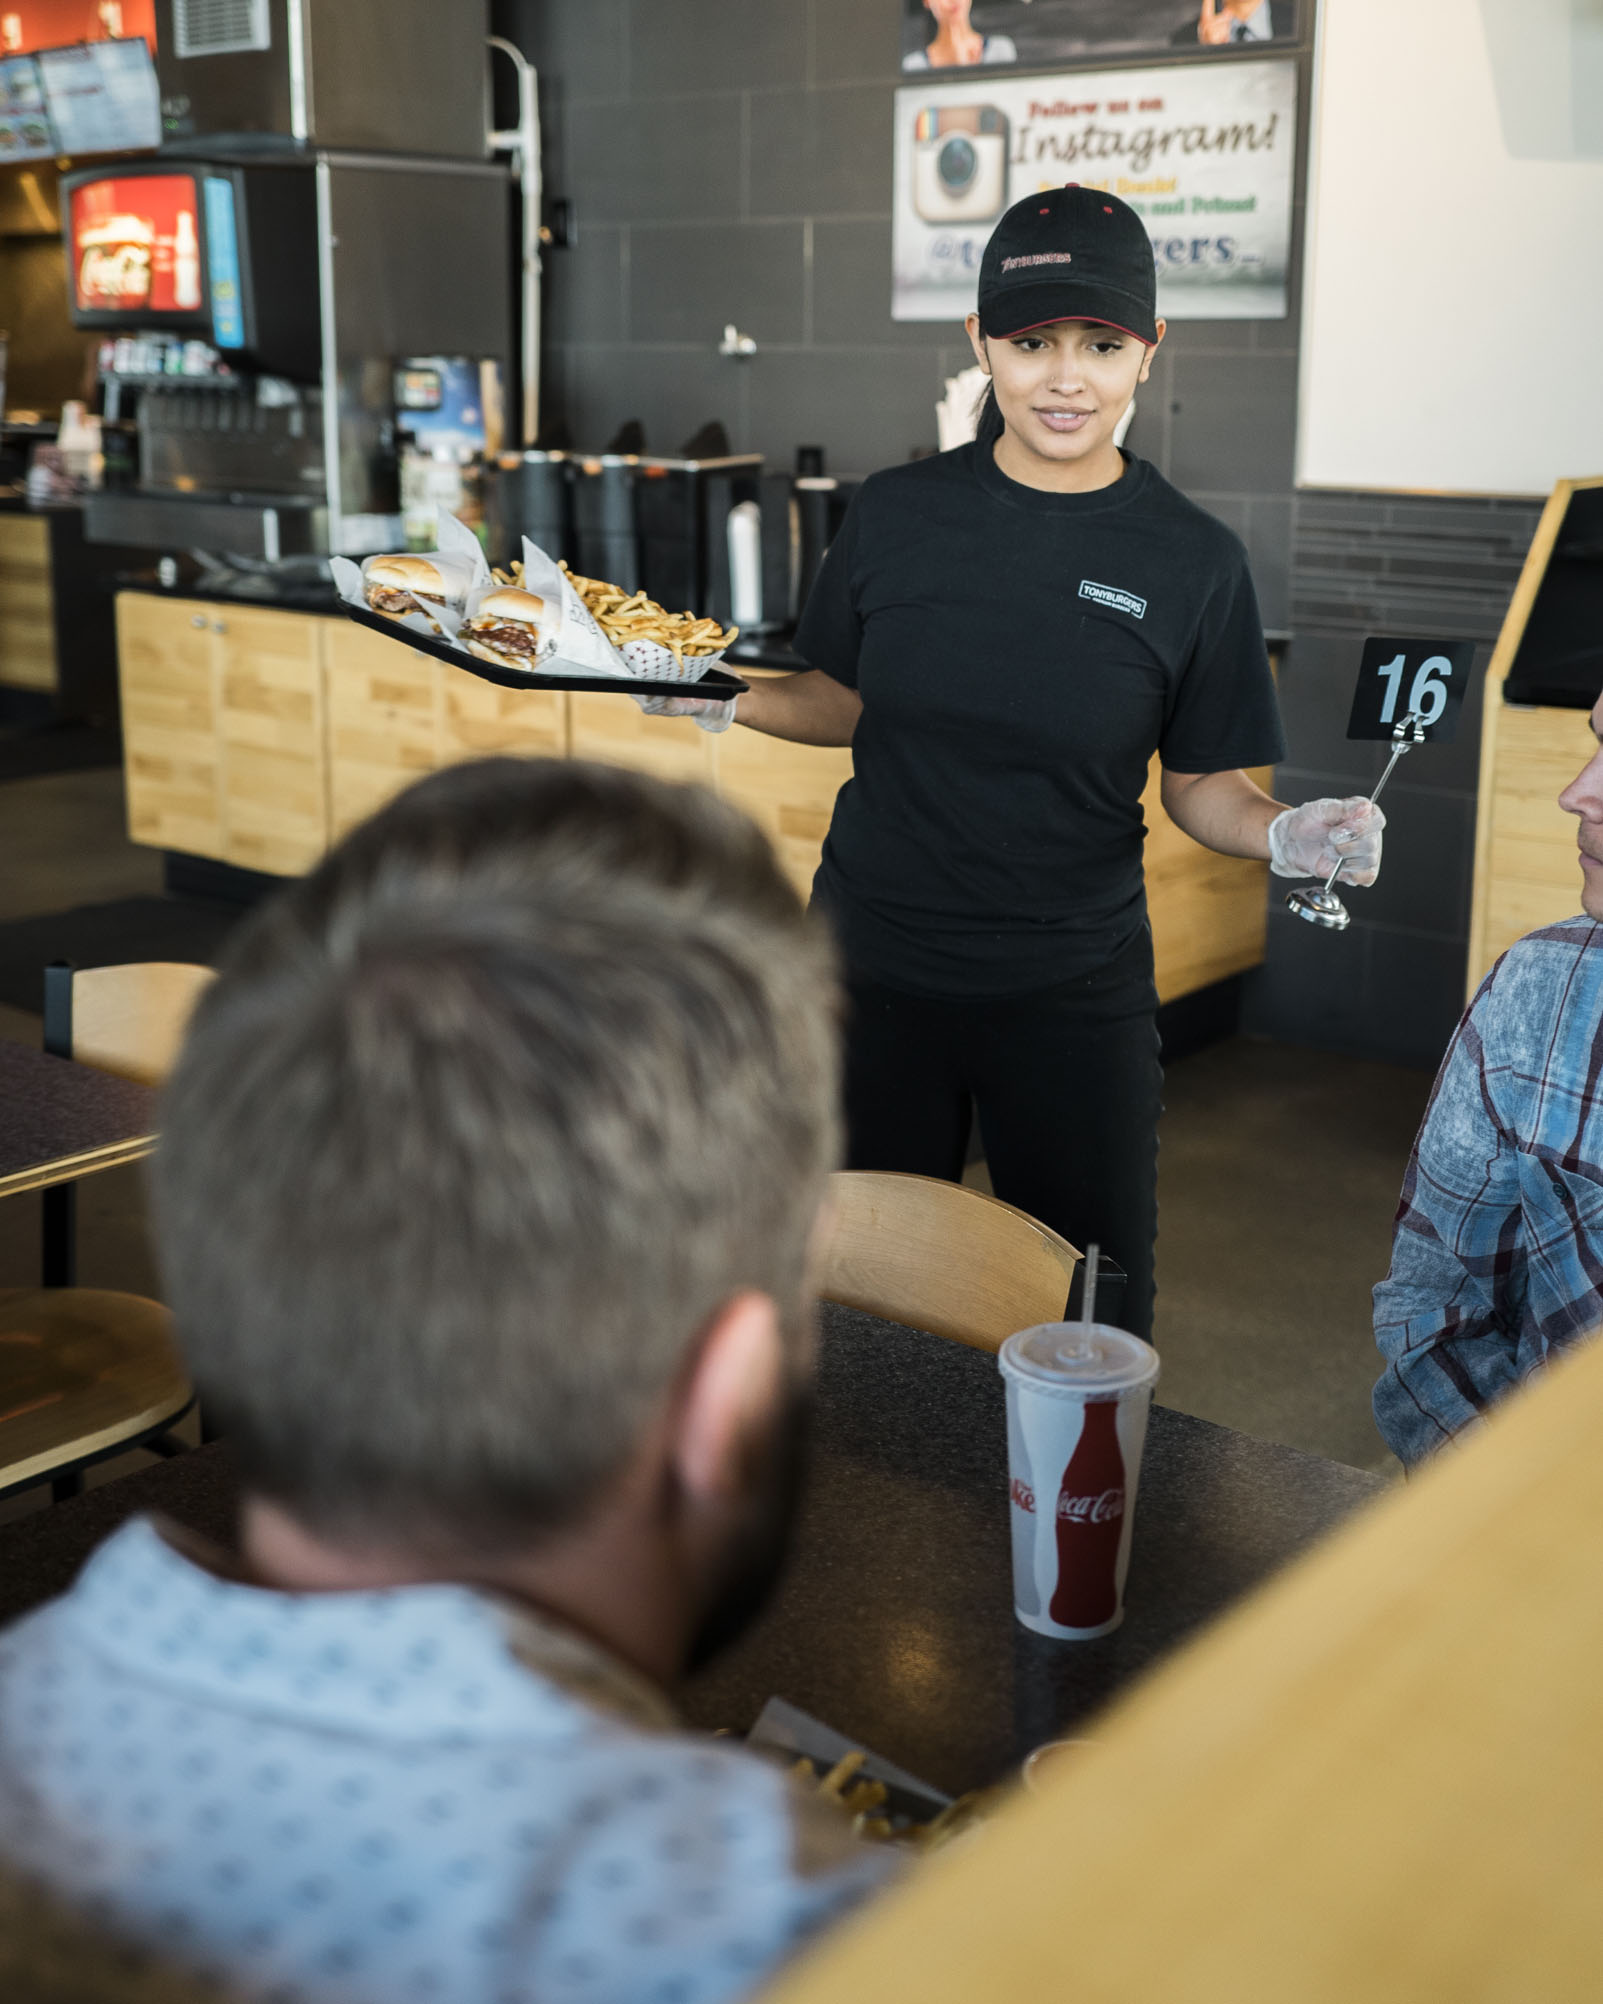 tonyburgers-big-american-story-01008.jpg